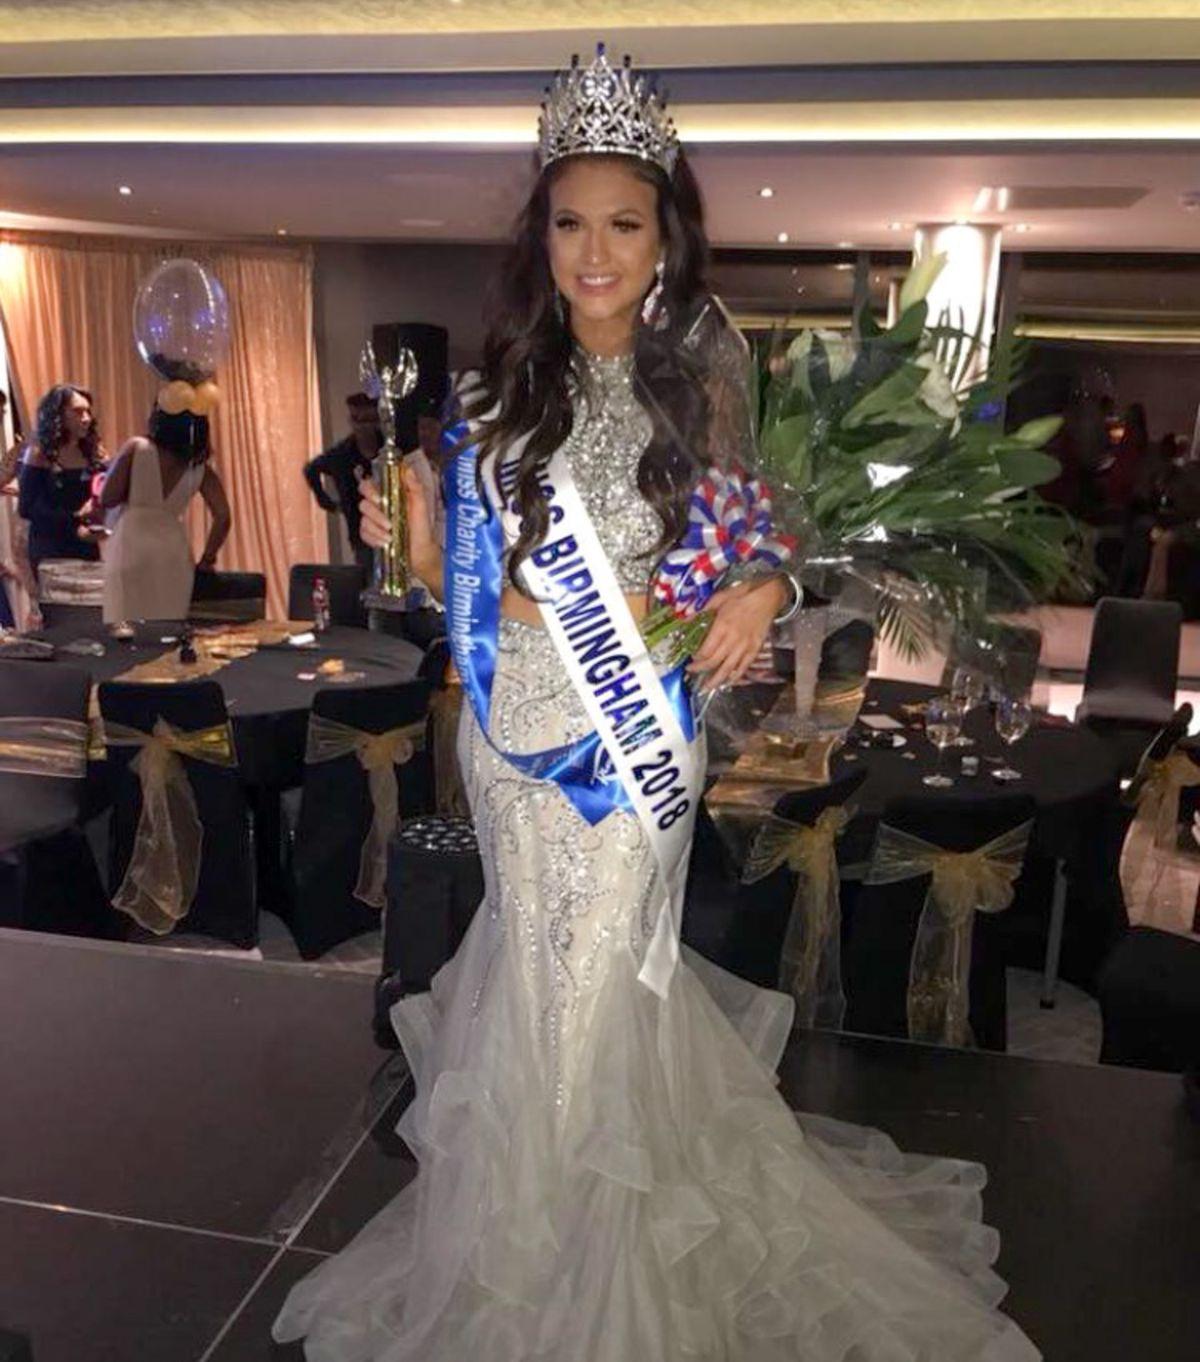 Sacha won Miss Birmingham 2018